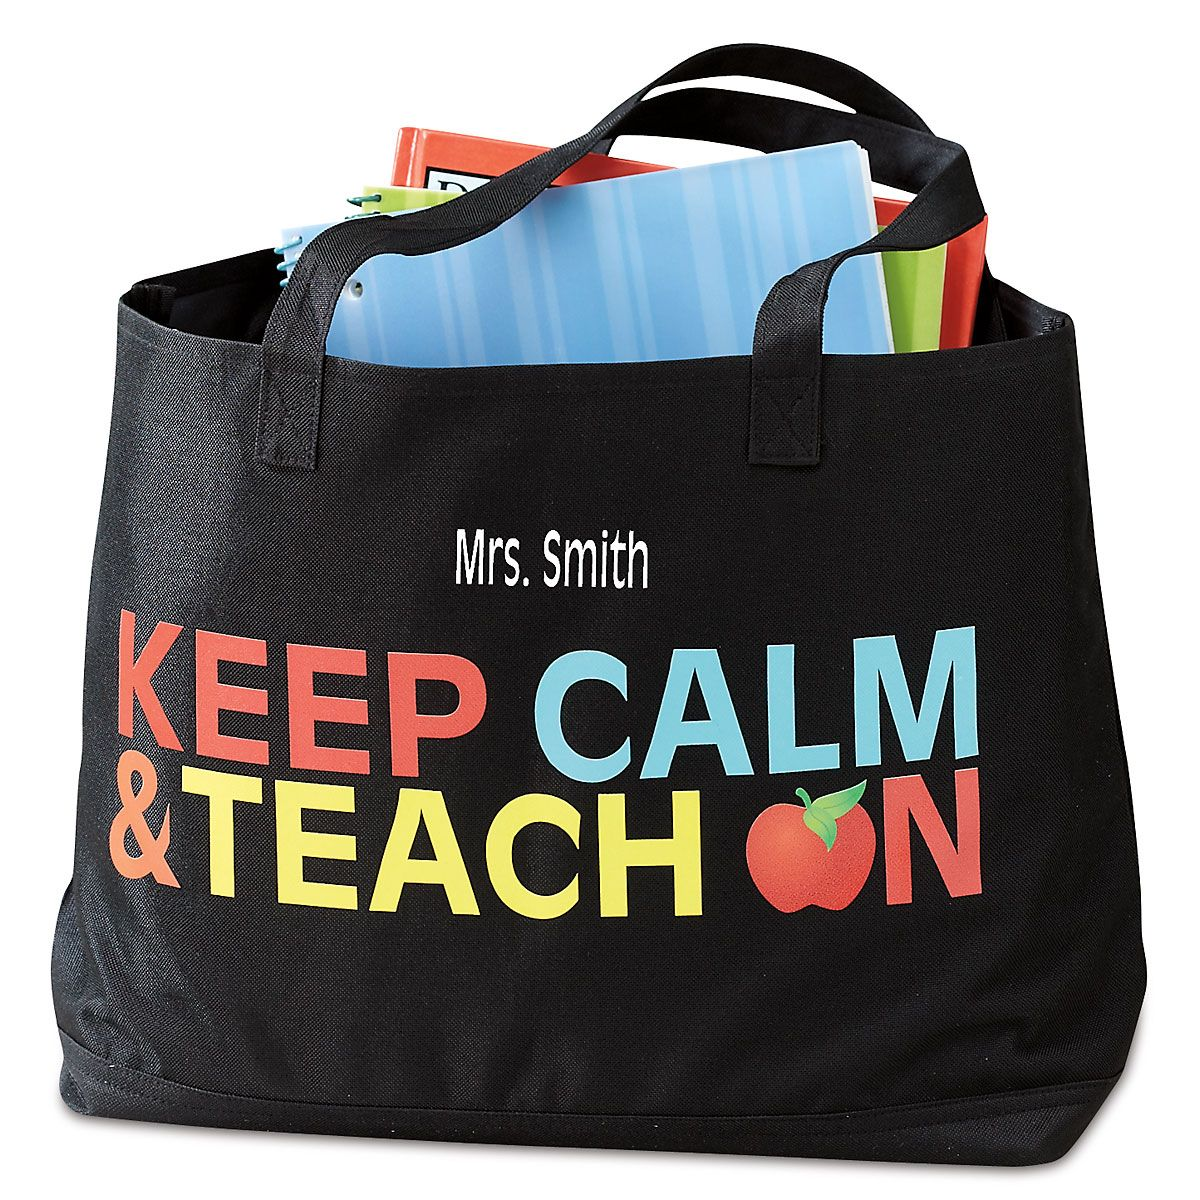 Personalized Teacher Tote